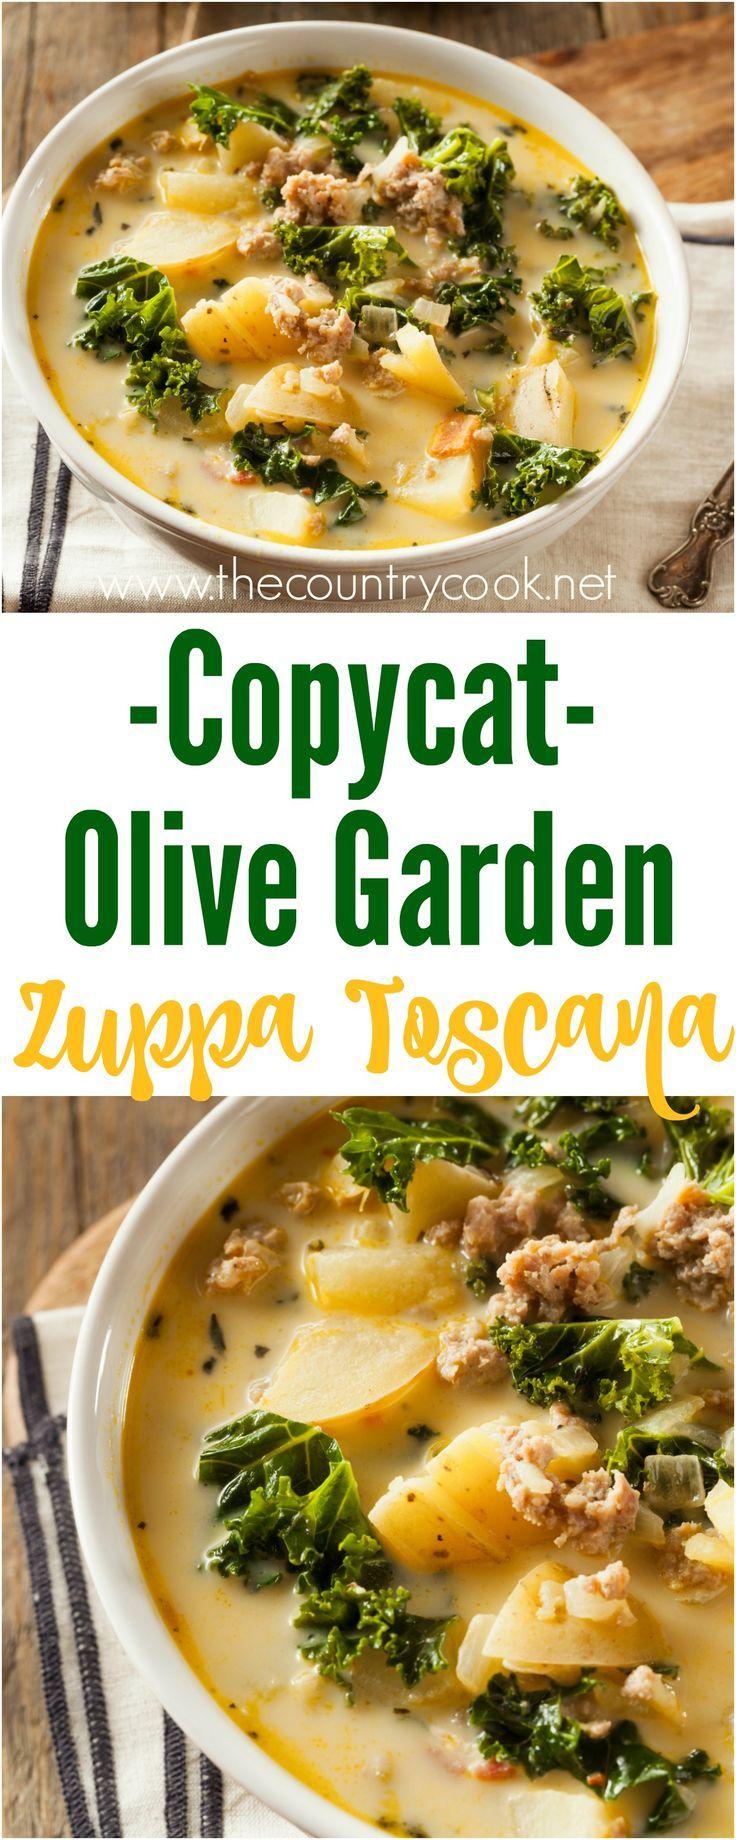 Best 20 Olive Garden Soups Ideas On Pinterest Cooking Gnocchi Olive Garden Pasta And Olive